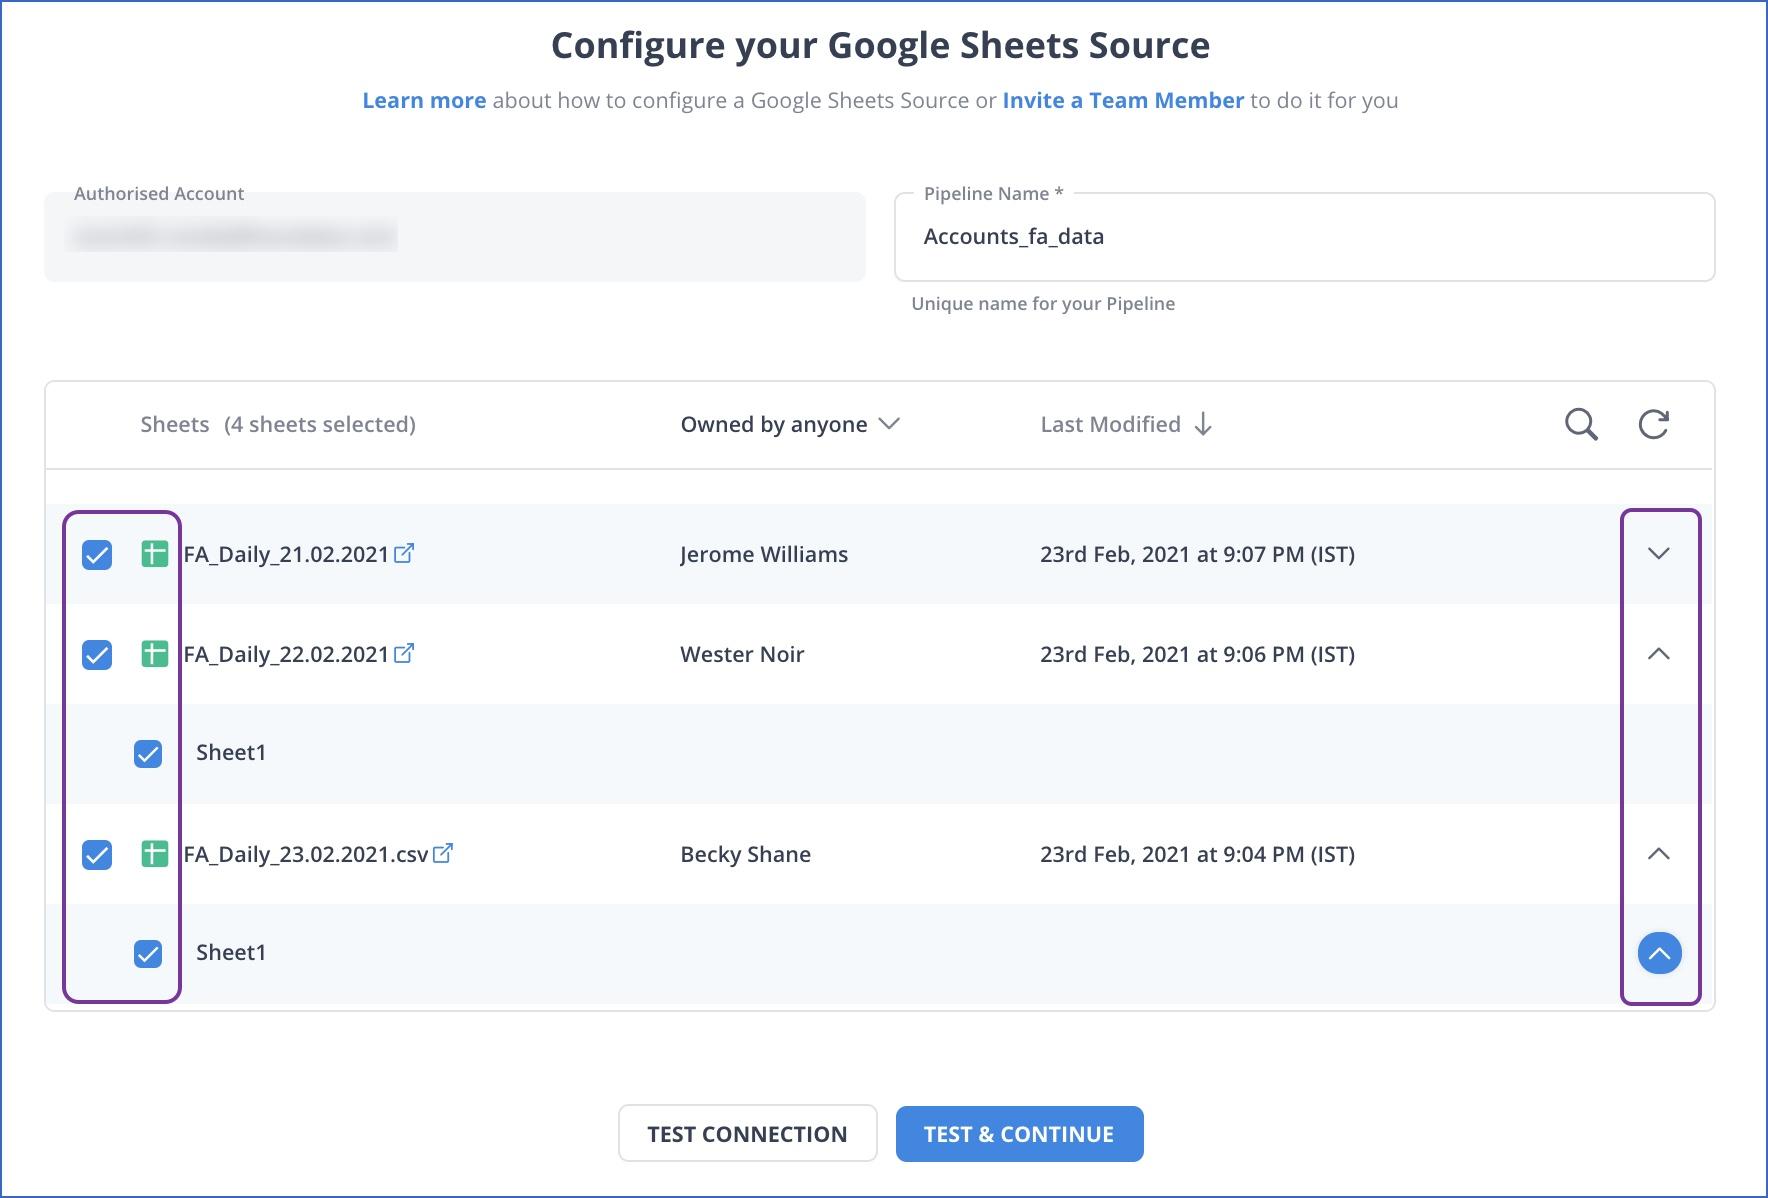 Google Sheets Configuration